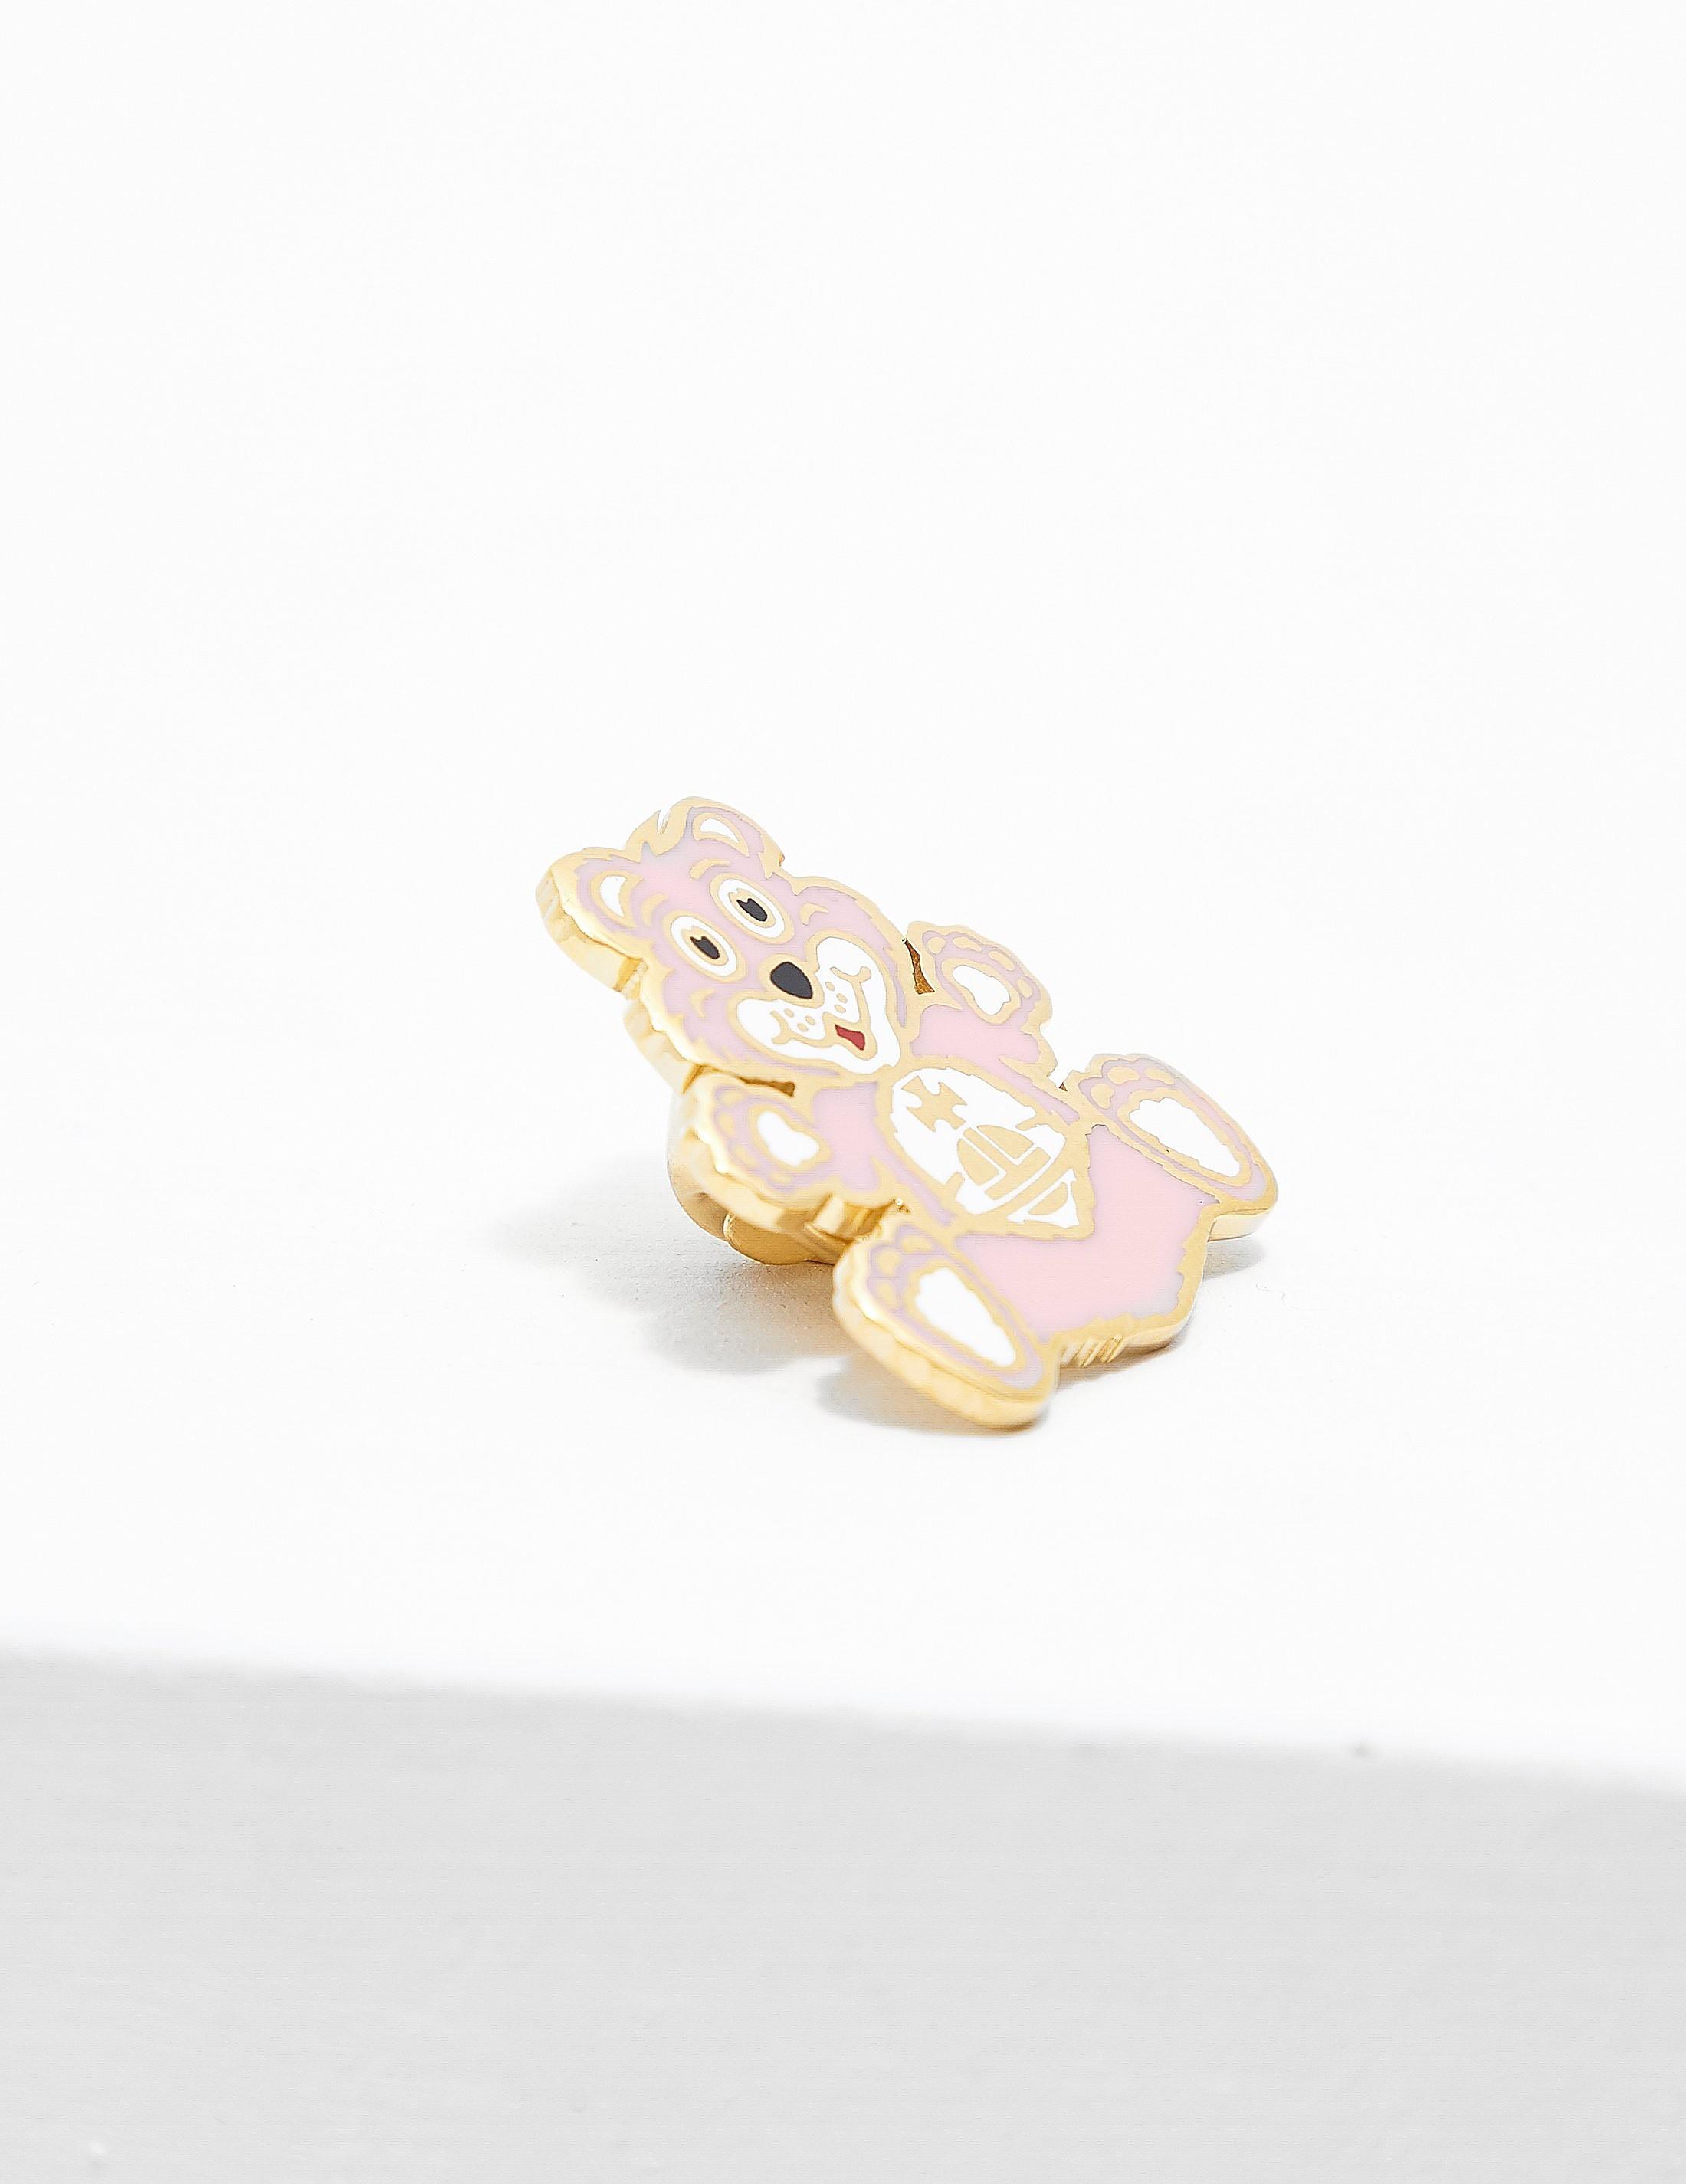 Vivienne Westwood Teddy Bear Pin